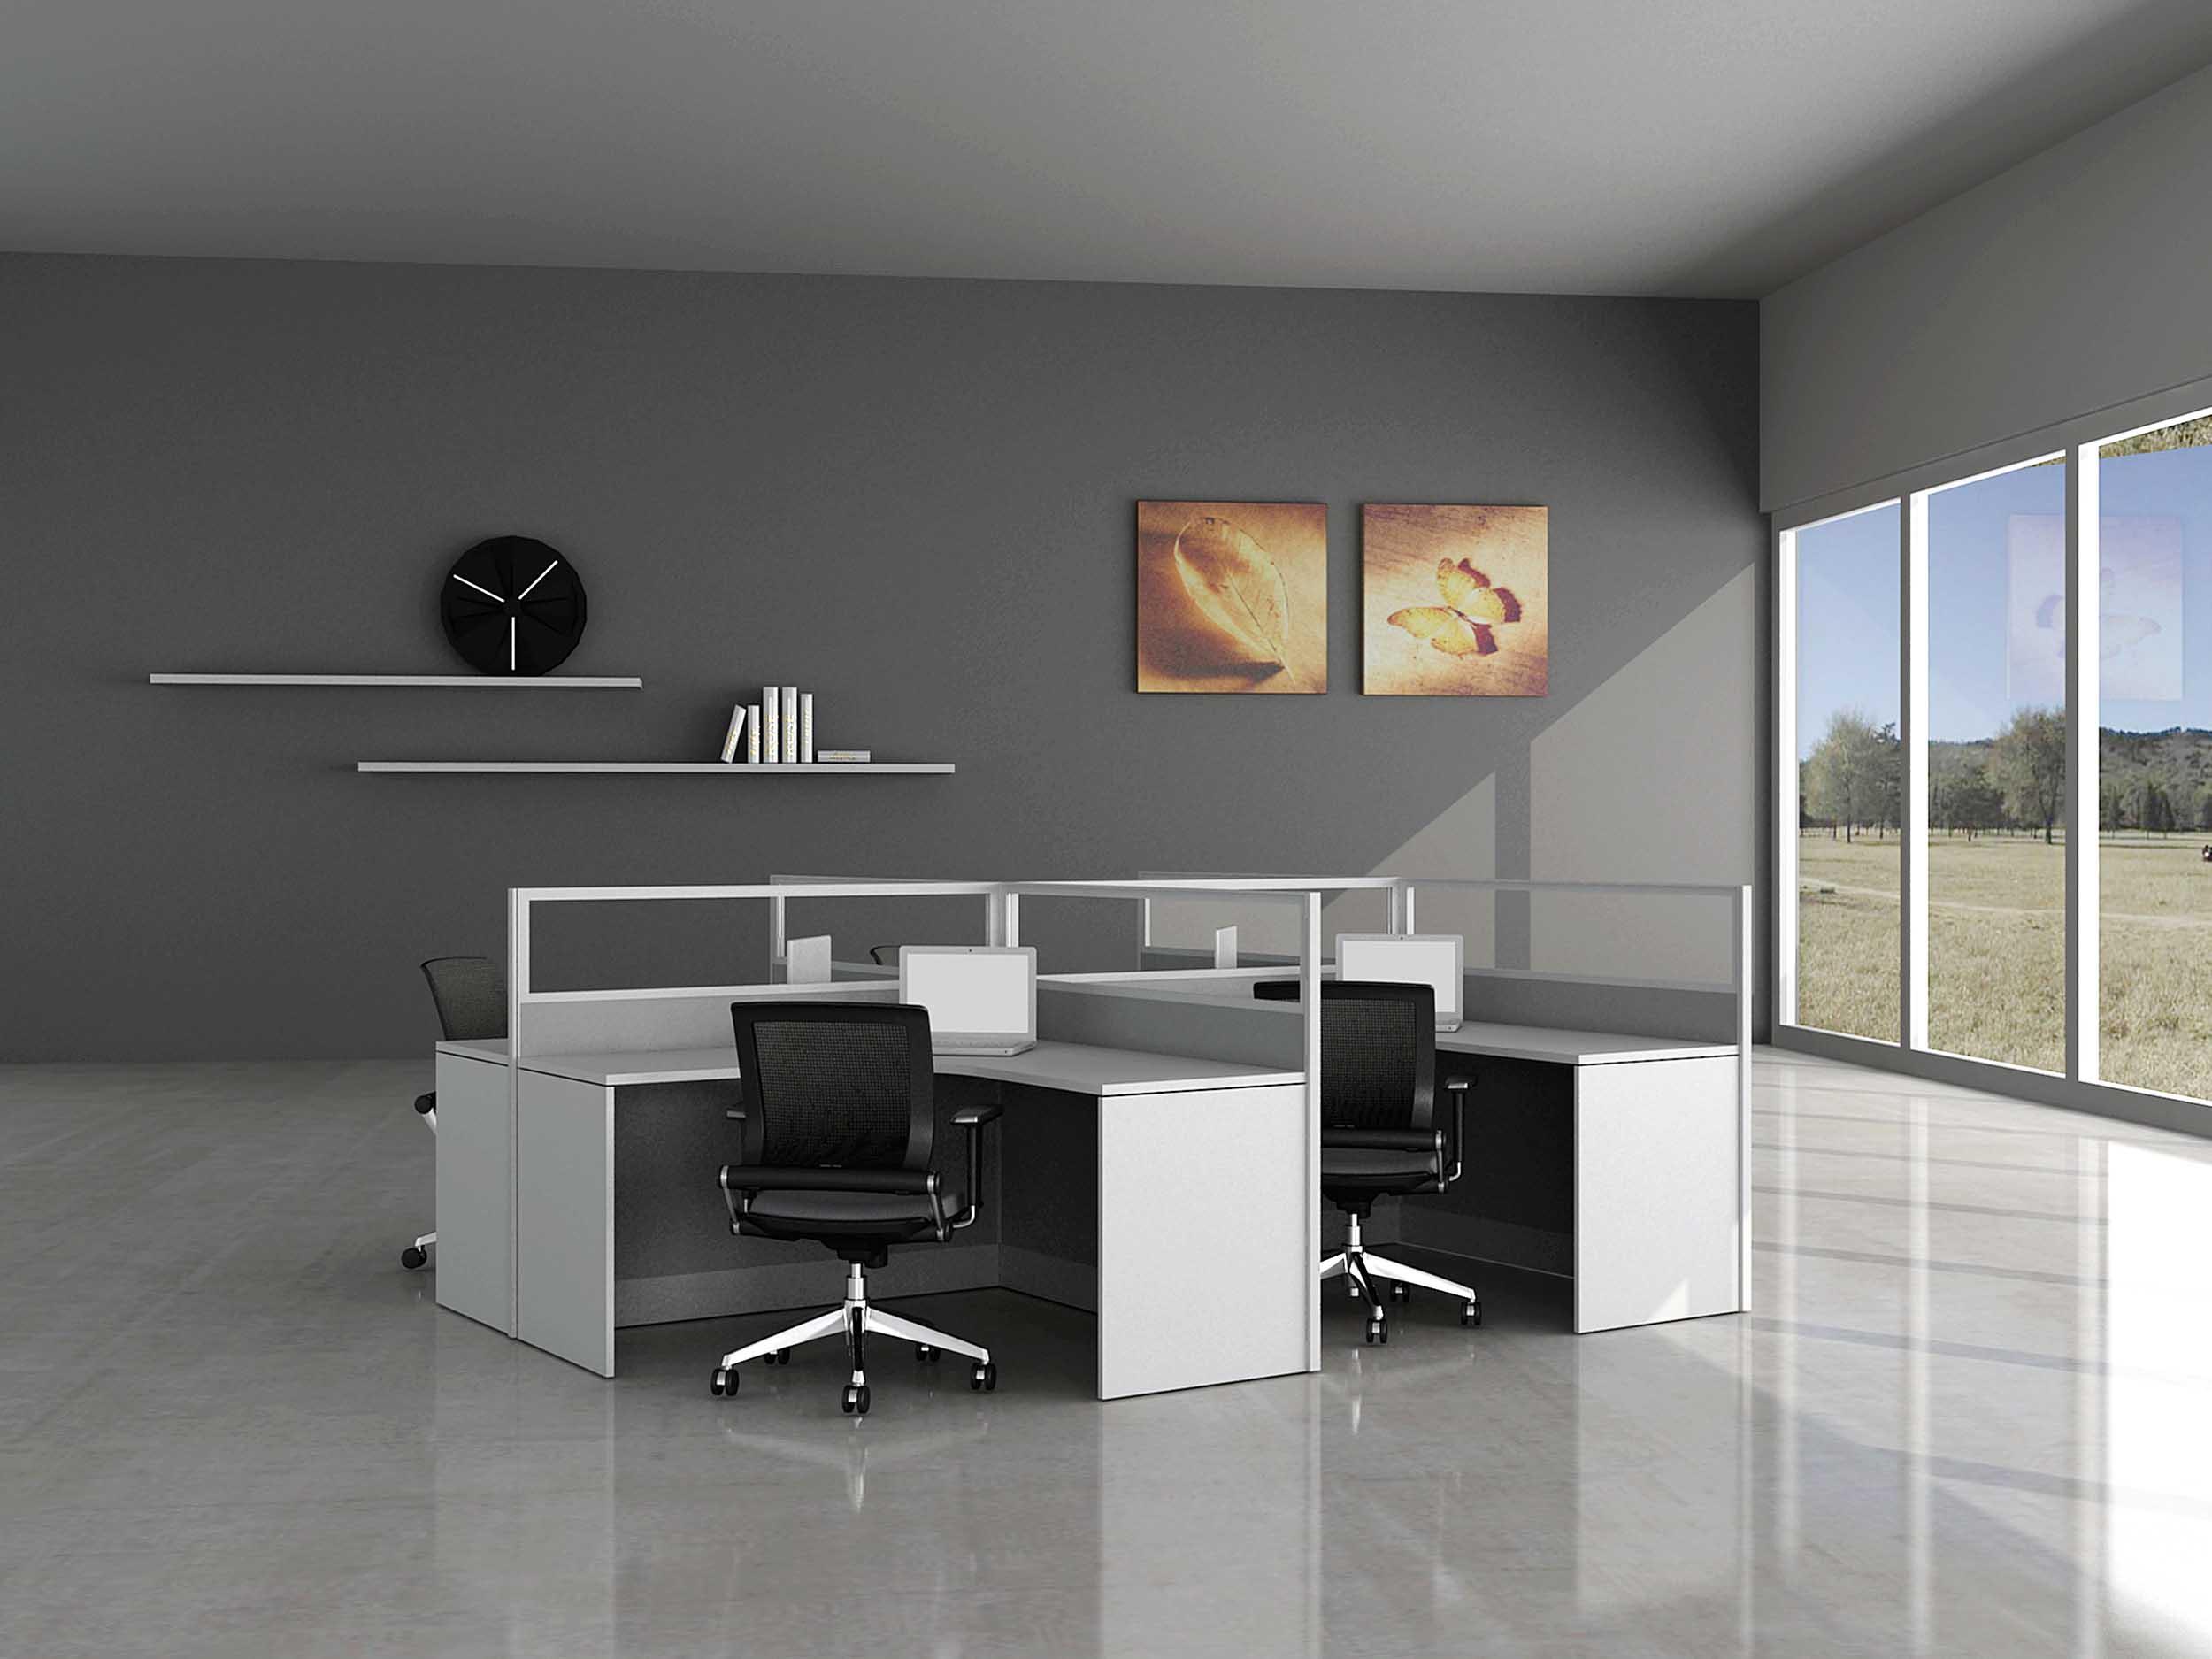 cub culo de design moderno mobili rio de escrit rio